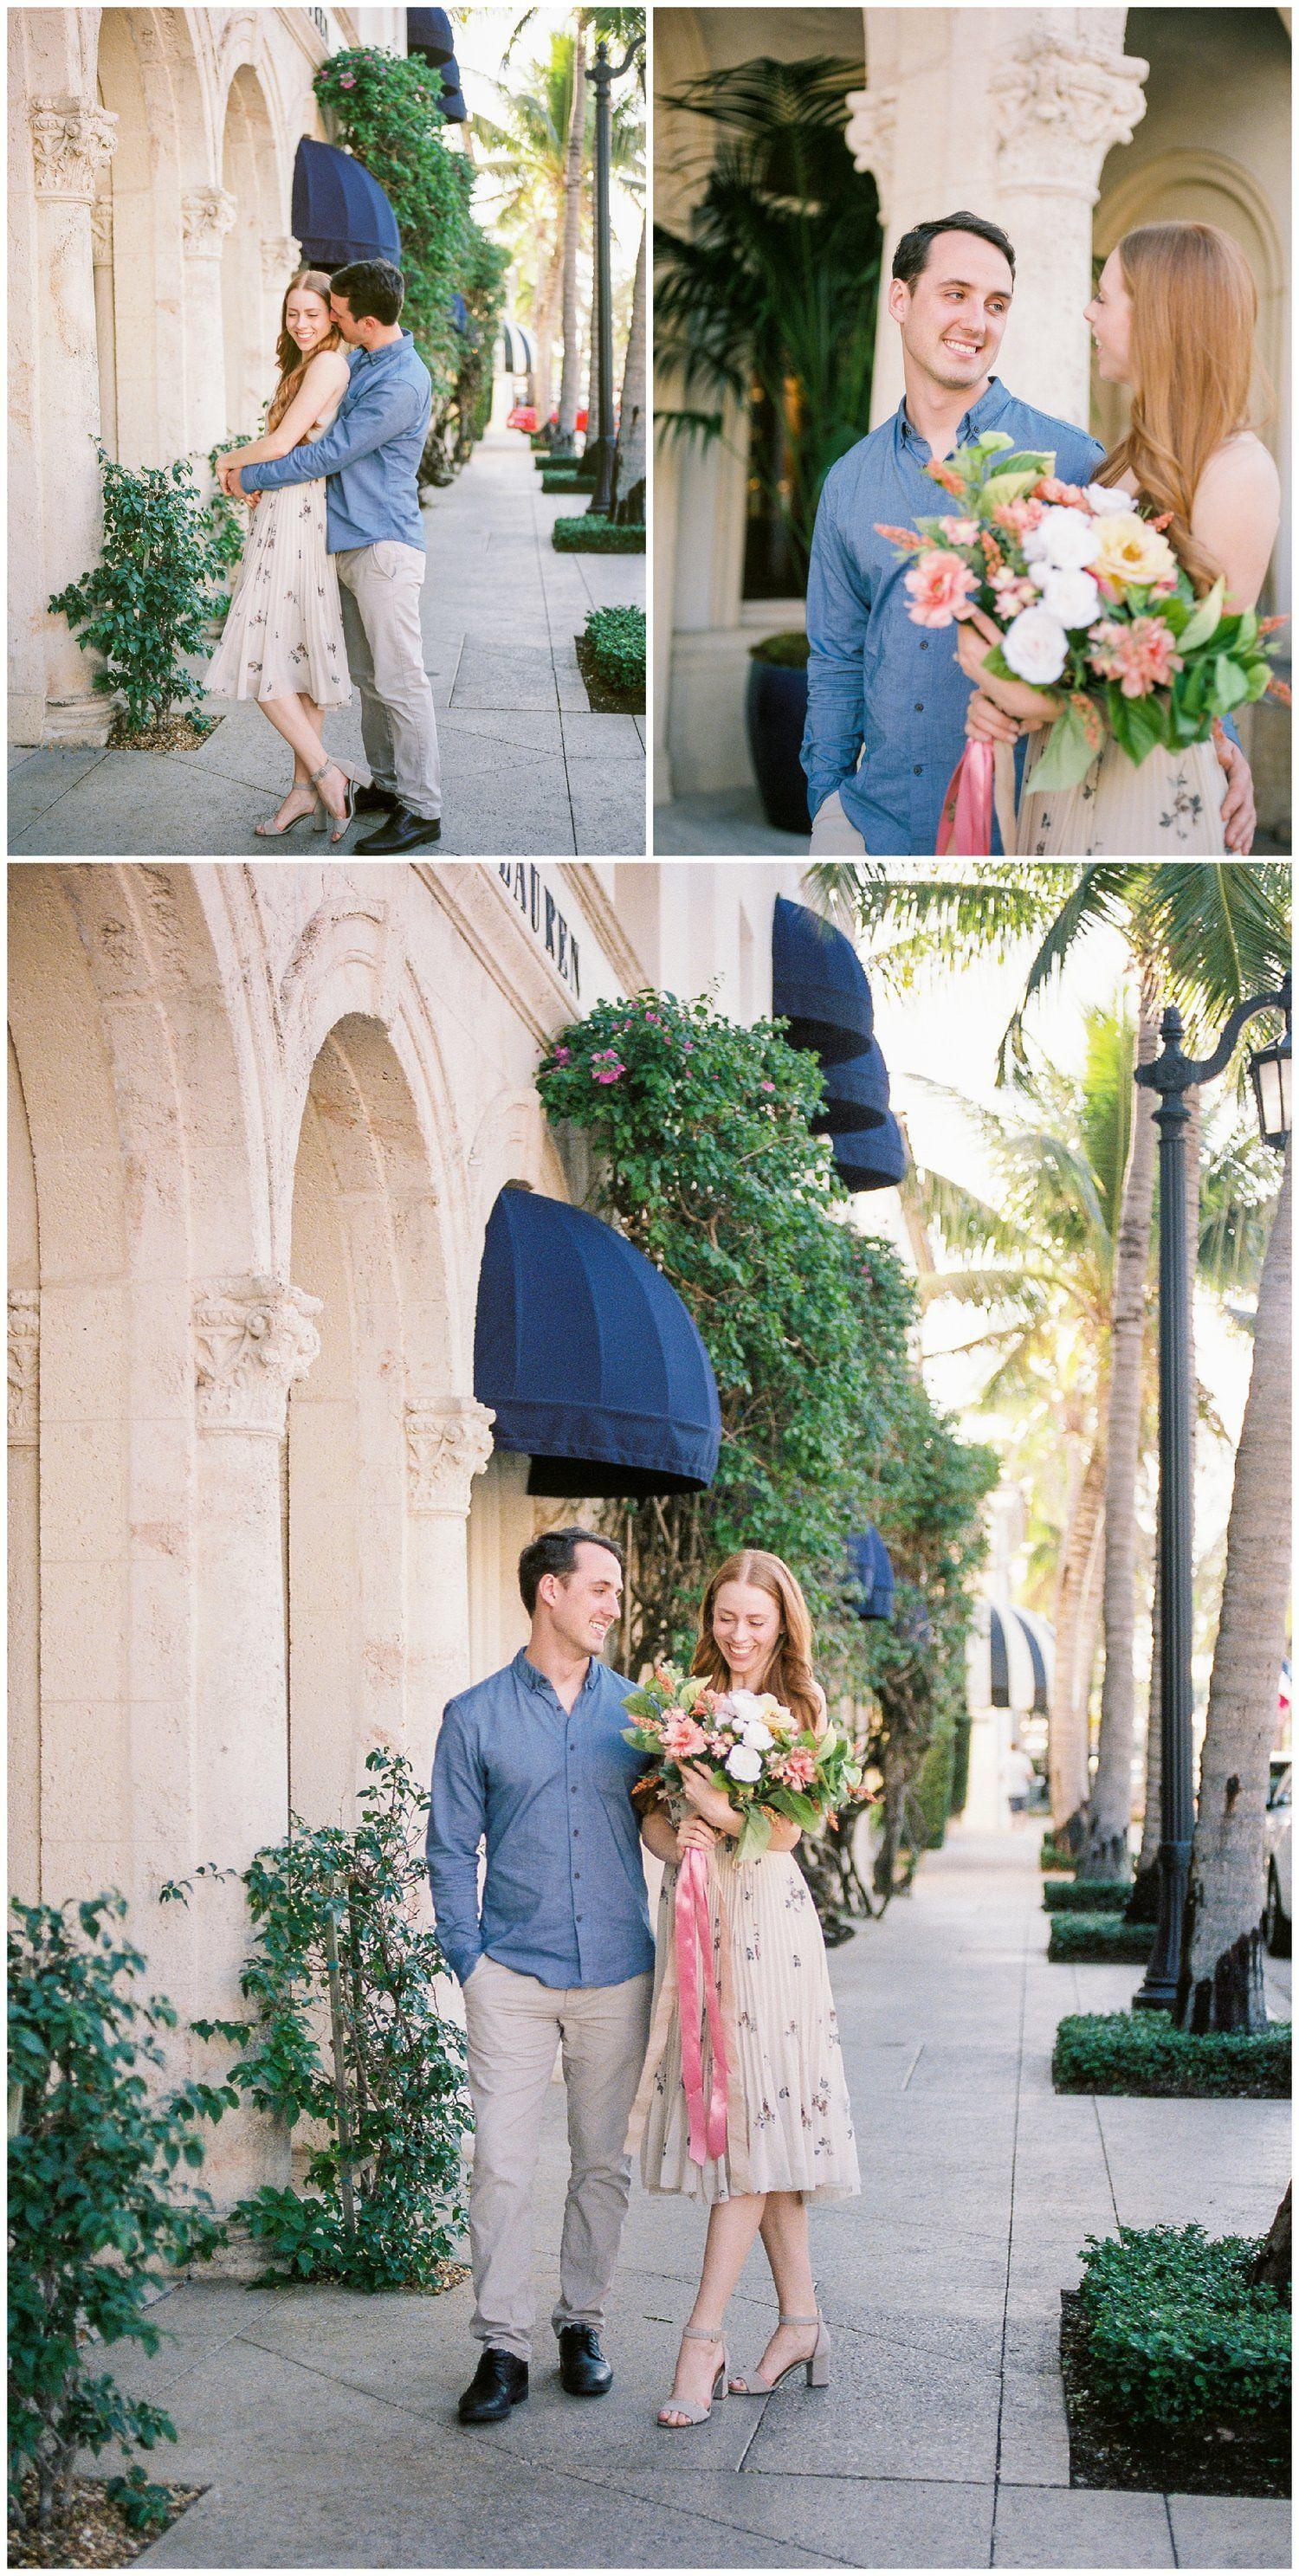 worth ave palm beach fl engagement photographer Orlando